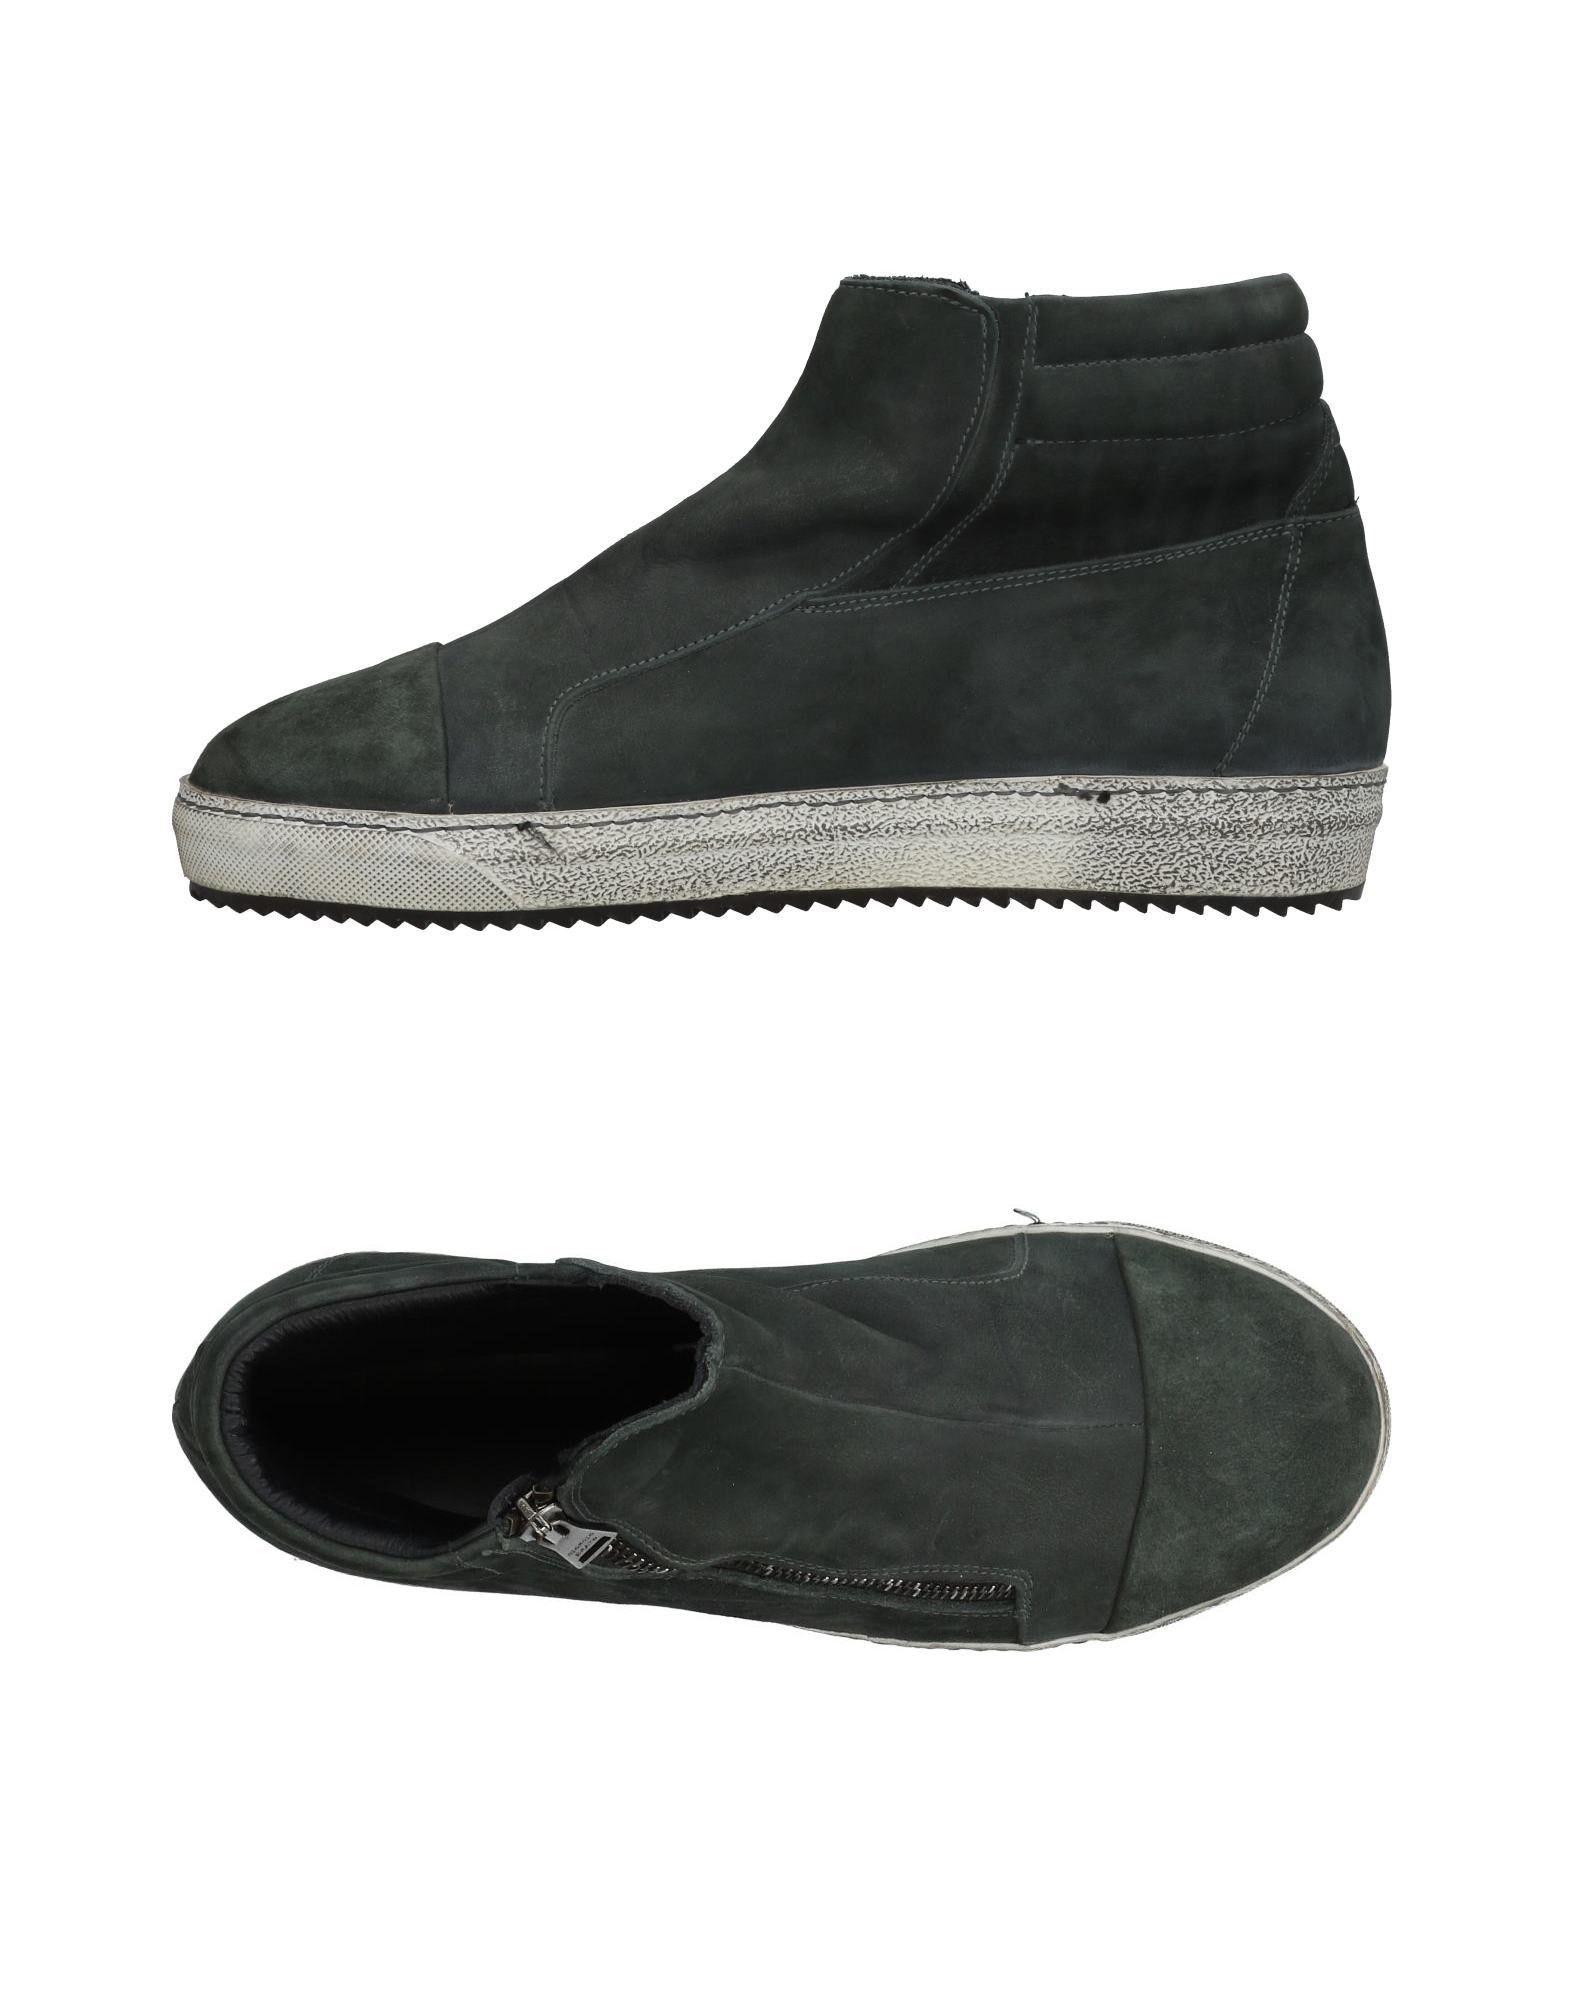 Giorgio Brato Sneakers Herren  11461942CU Gute beliebte Qualität beliebte Gute Schuhe 5eed46